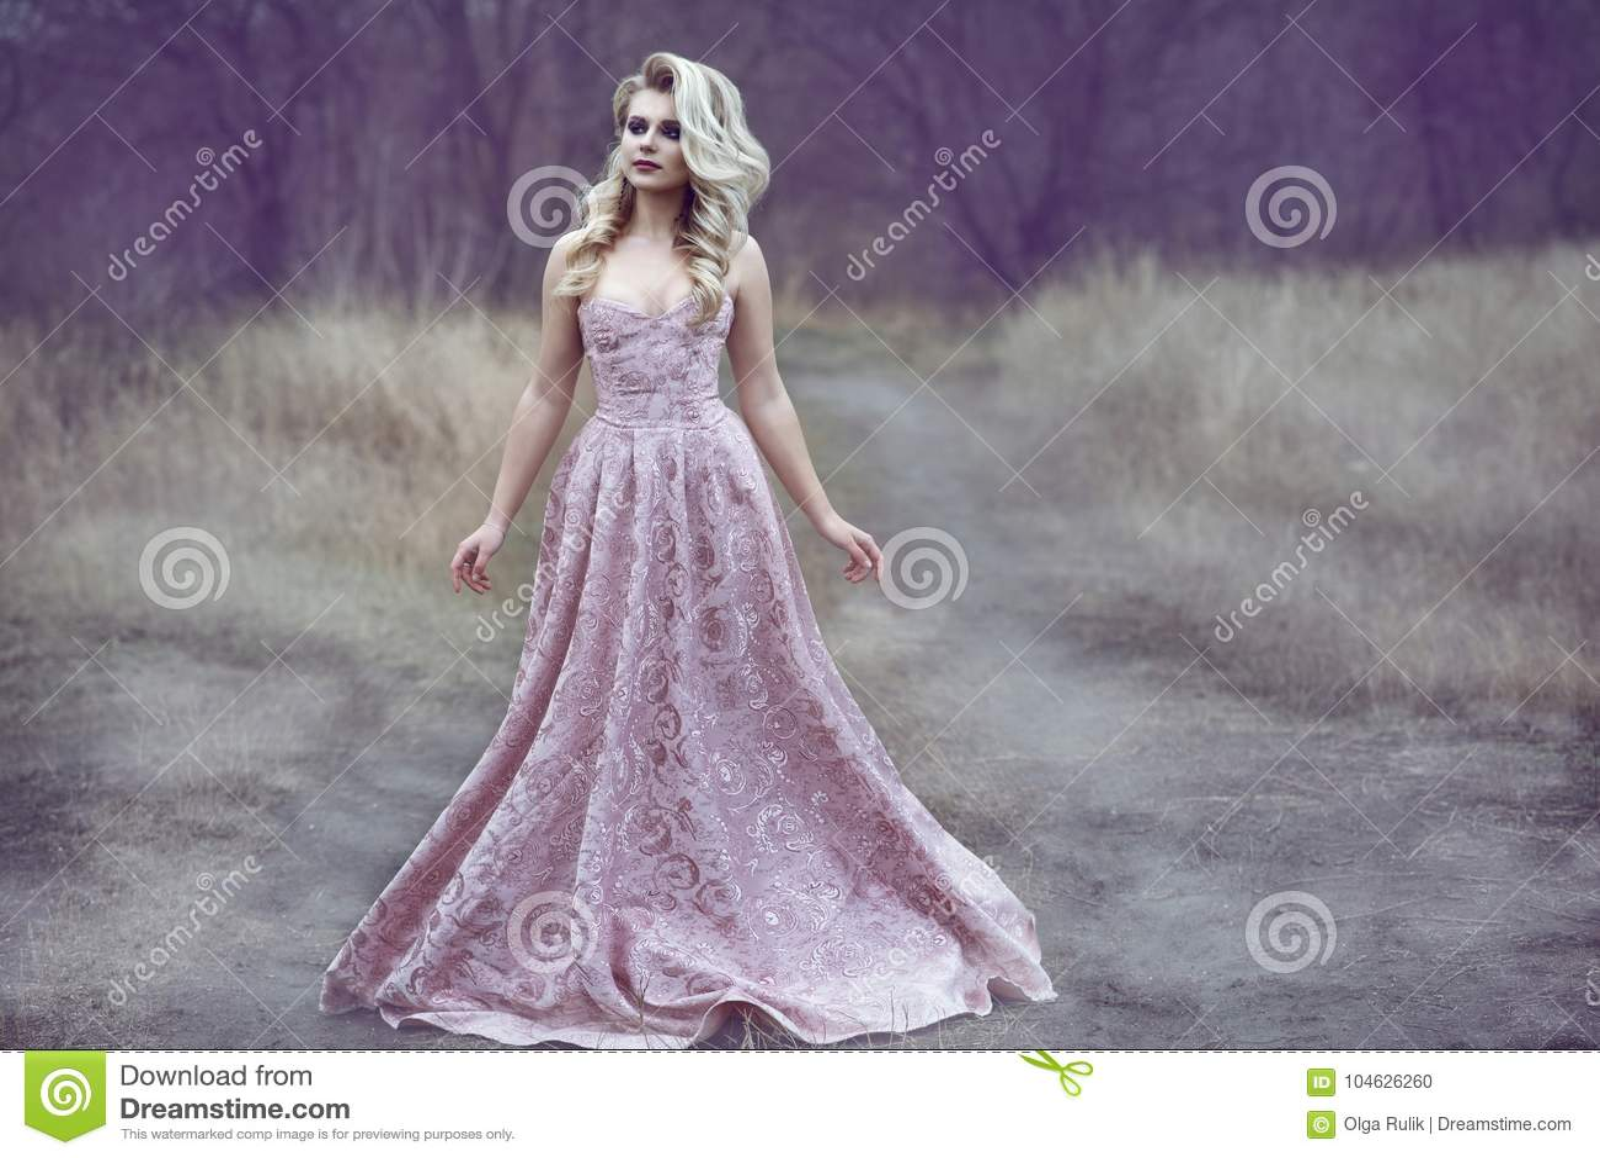 Schitterende blonde dame die met luxuriant kapsel in lange brokaatkleding langs de smalle weg in het hout lopen